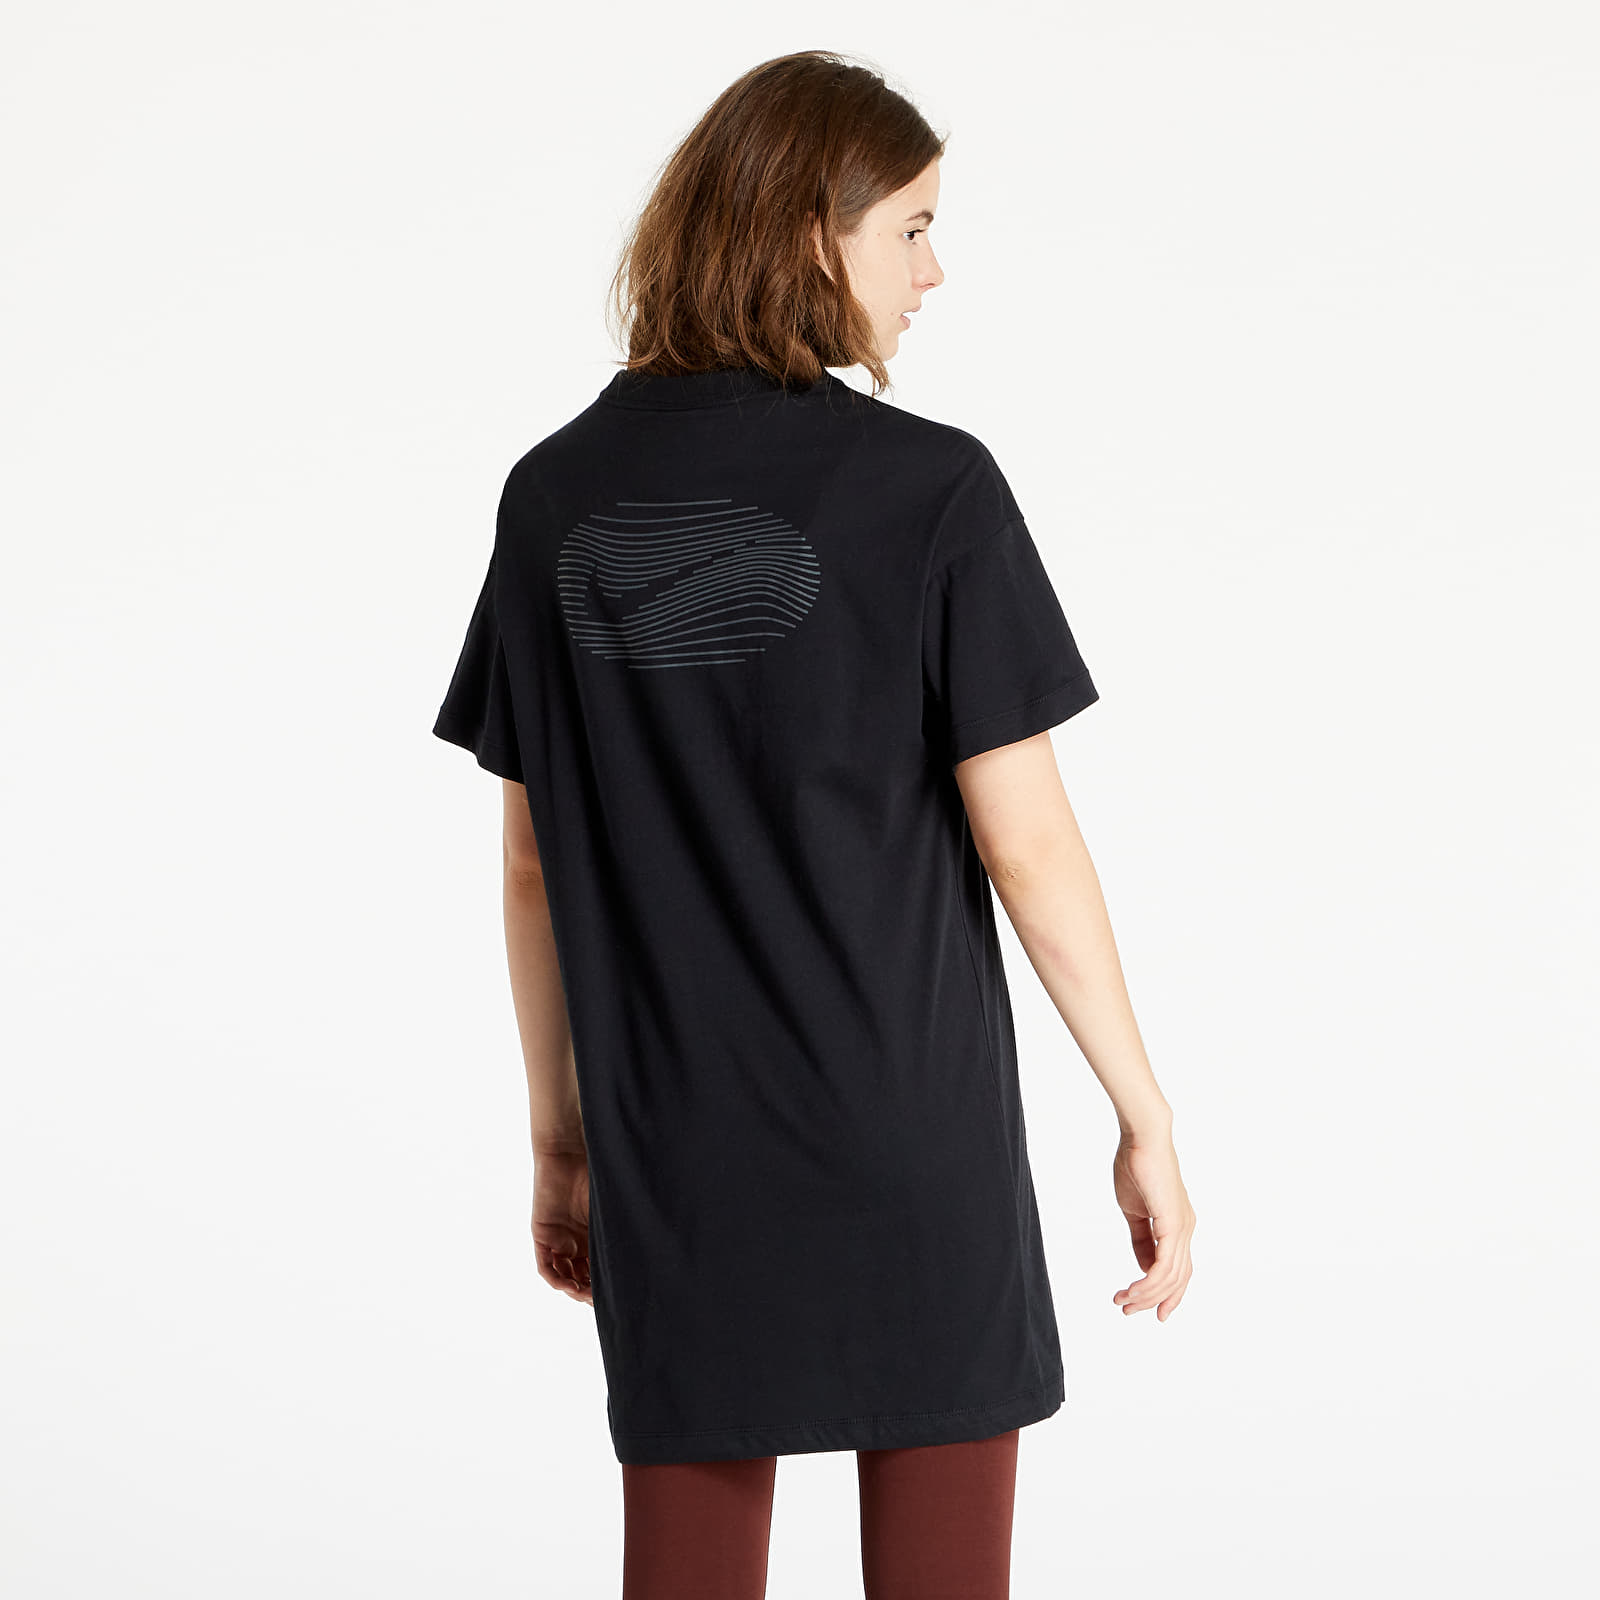 Nike Sportswear W NSW SS Tee Dress Black S